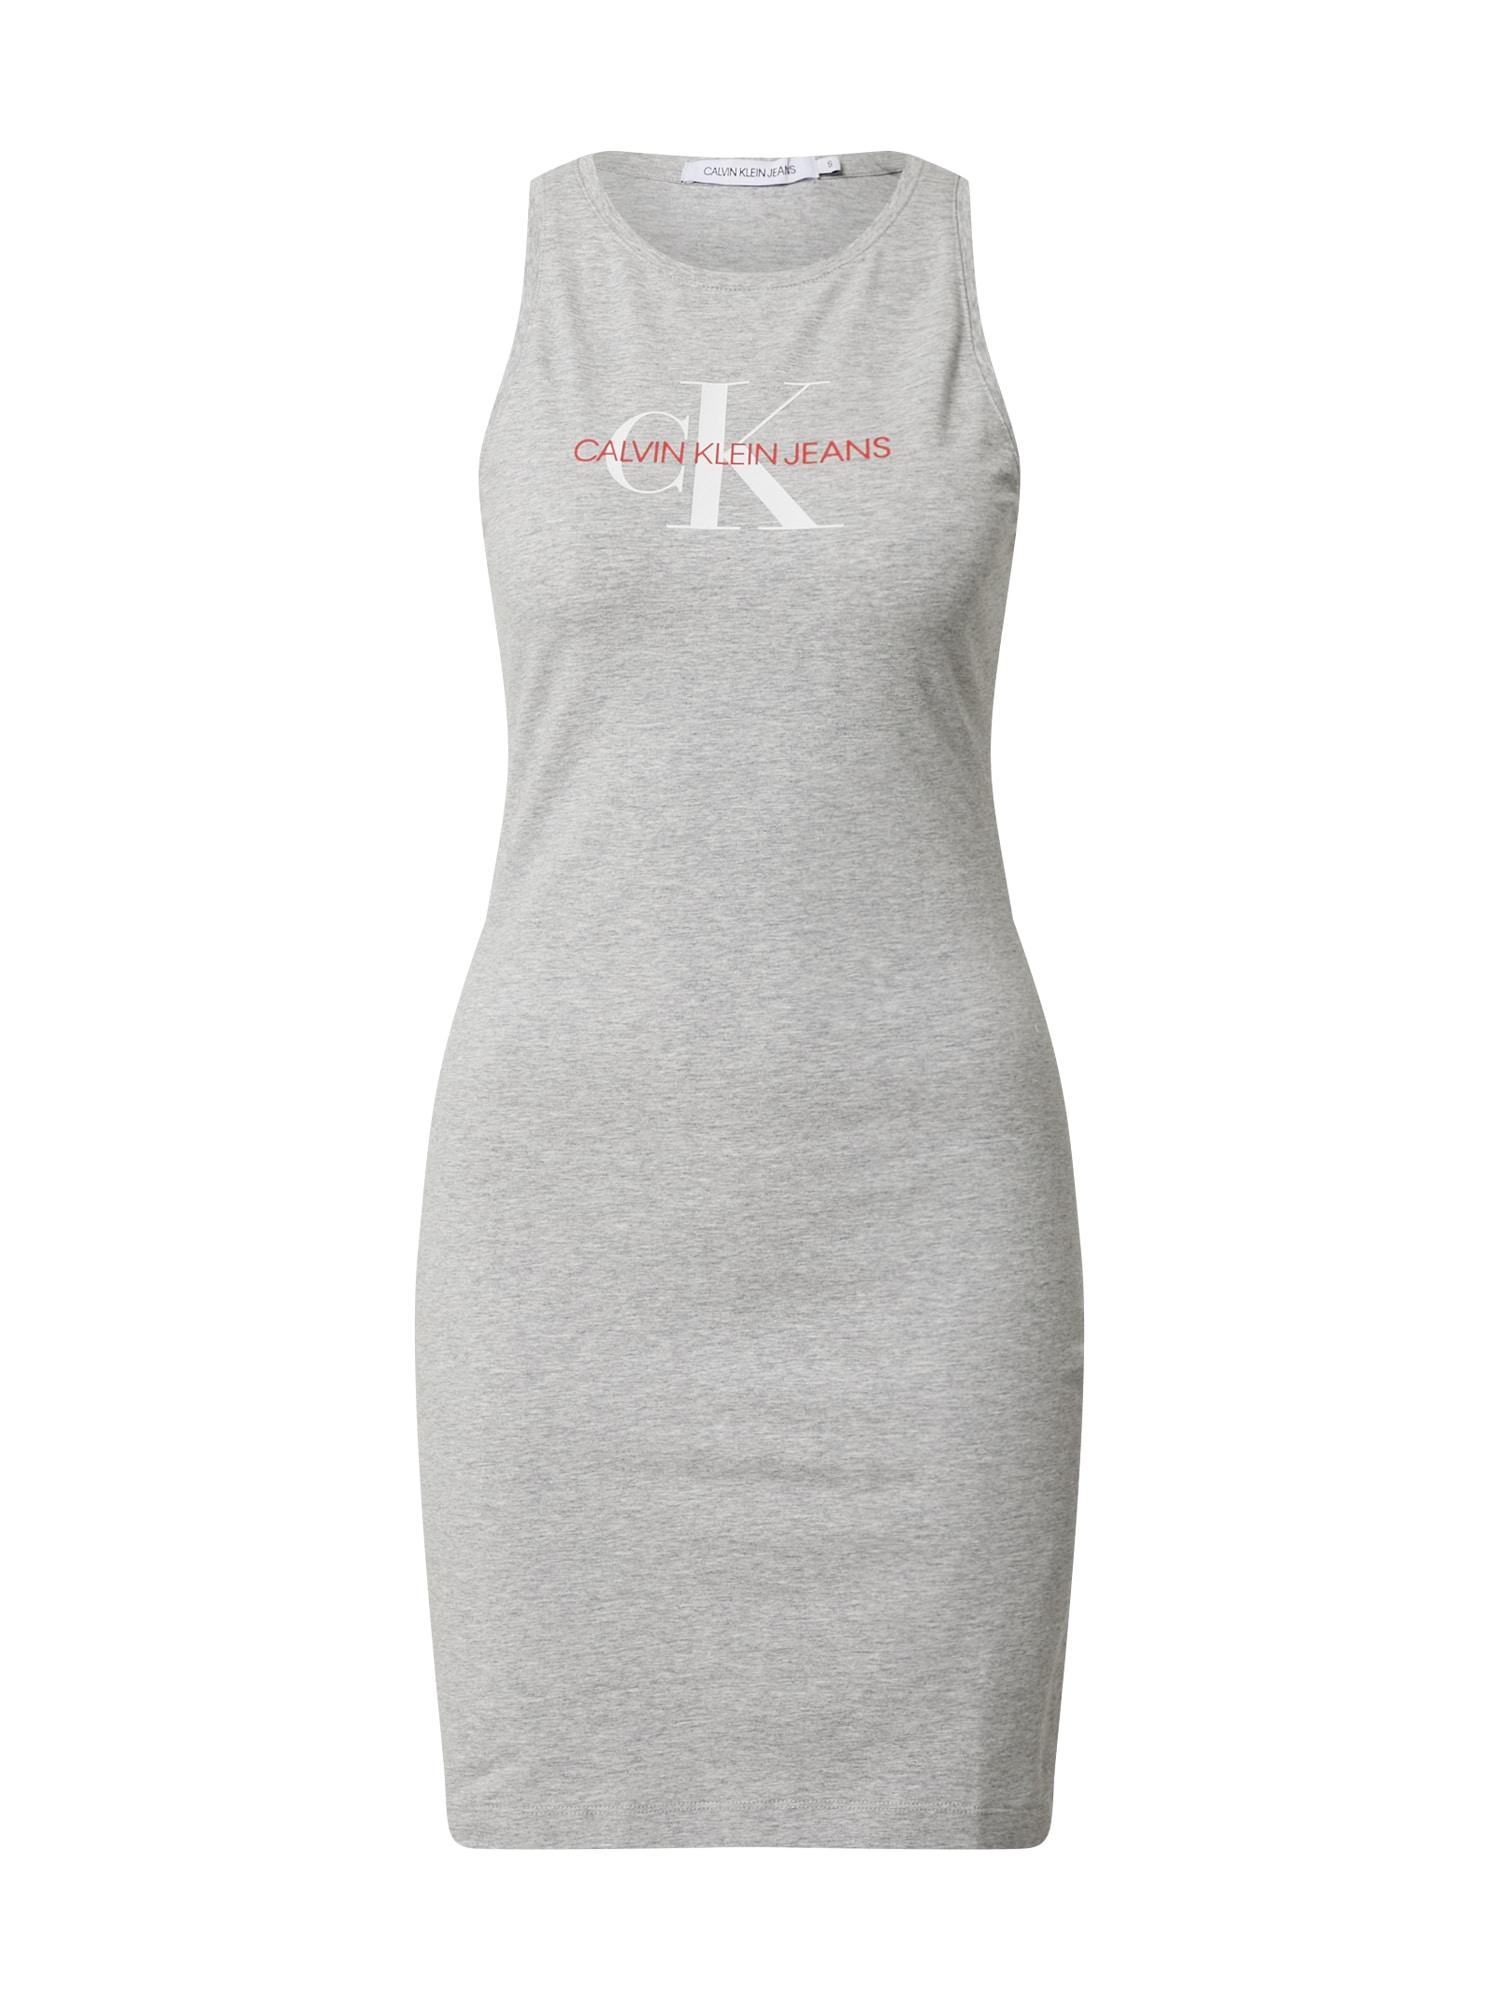 Calvin Klein Jeans Suknelė margai pilka